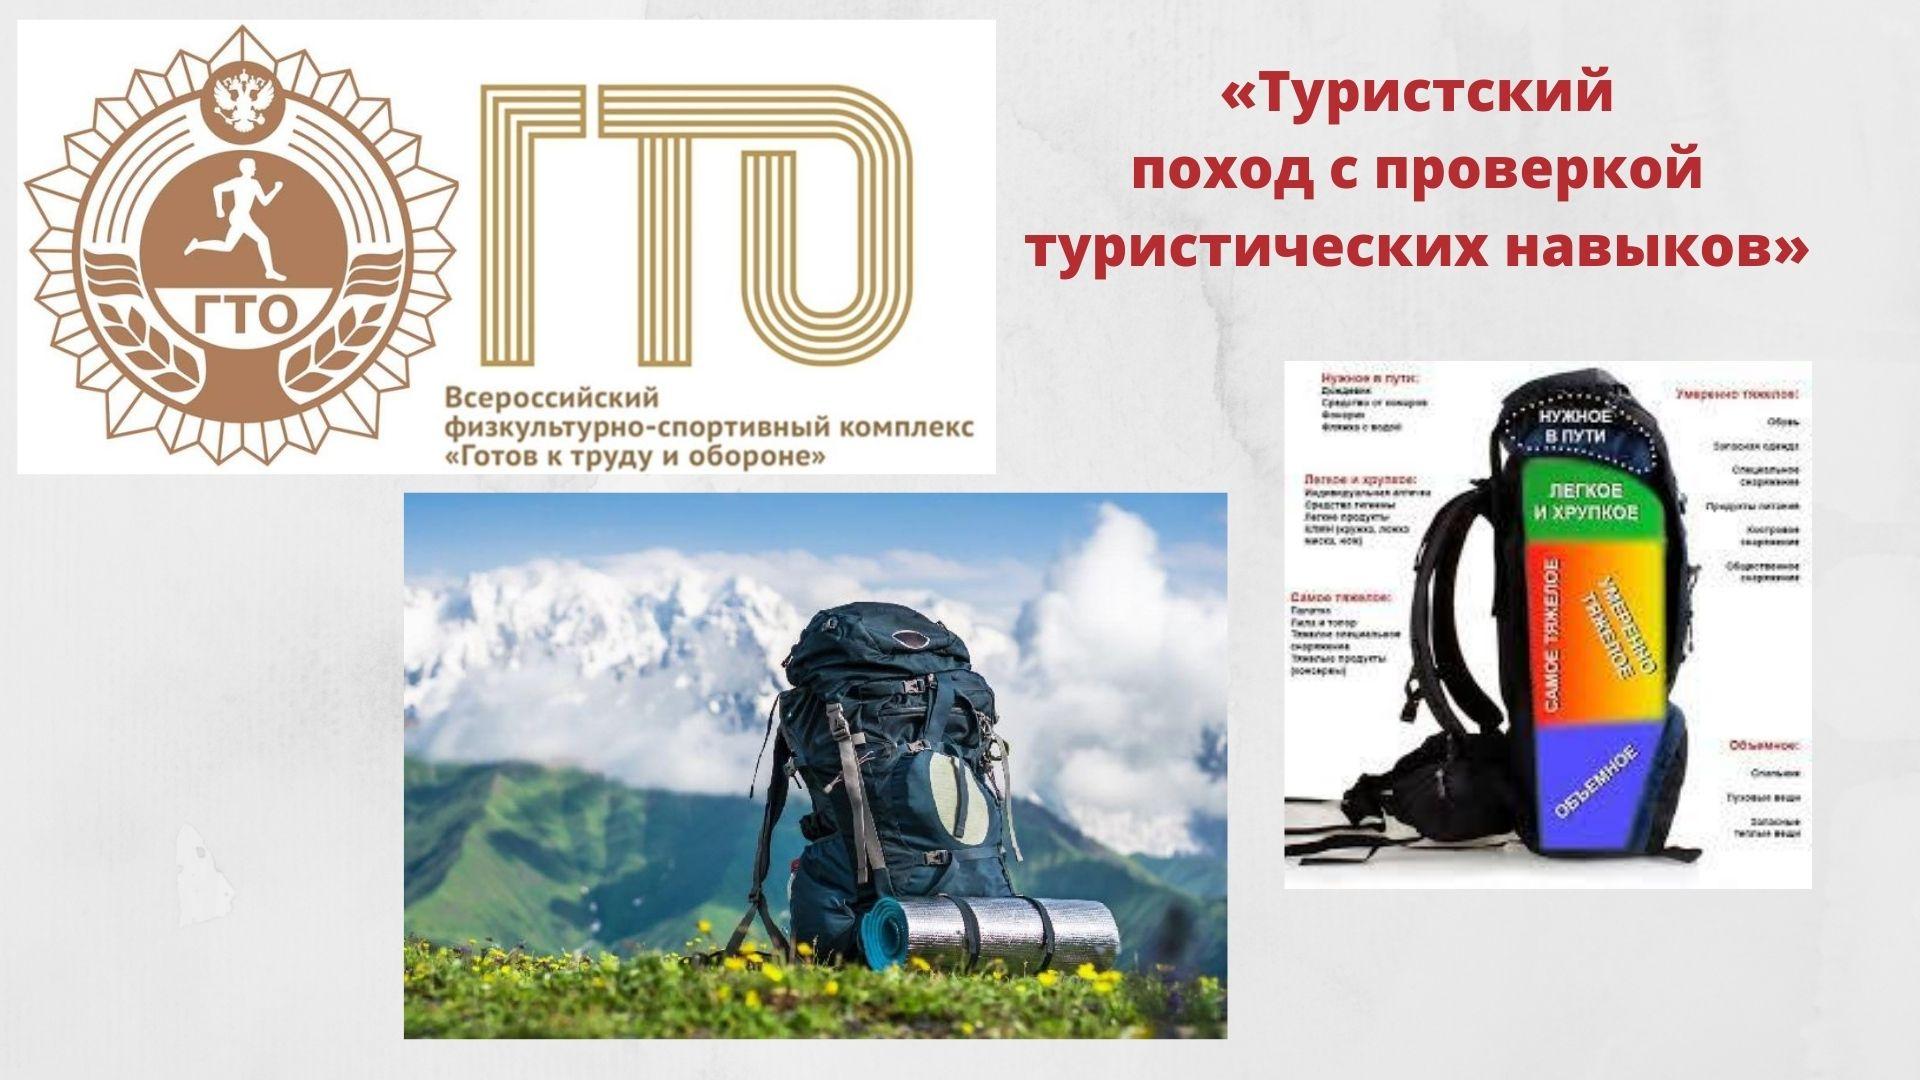 Туристский поход. Часть 6